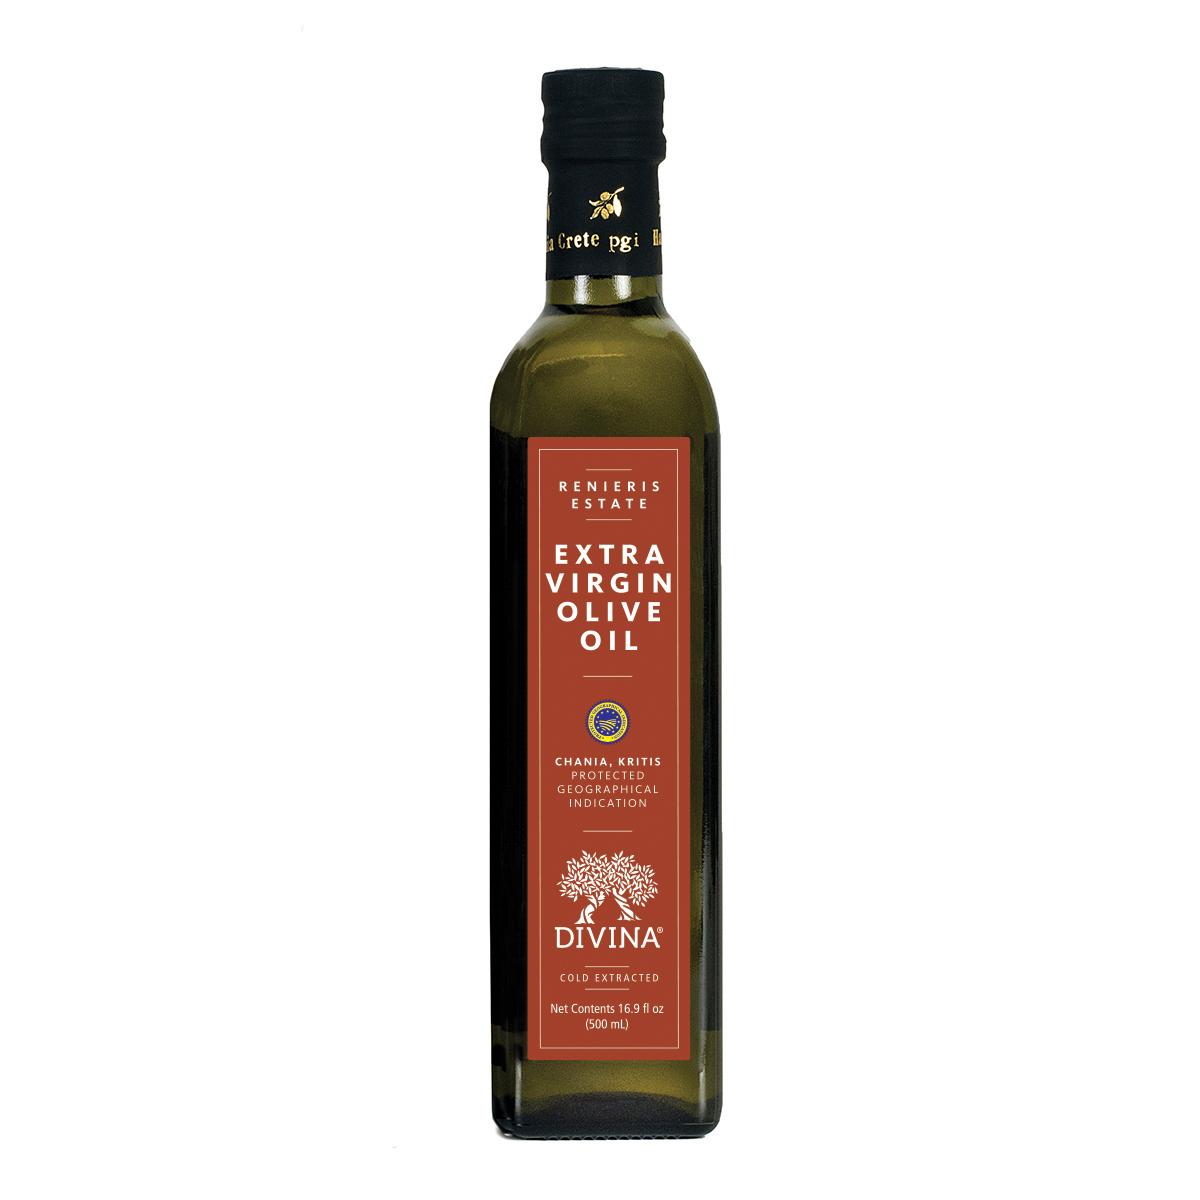 00160 - Renieris Estate Extra Virgin Olive Oil